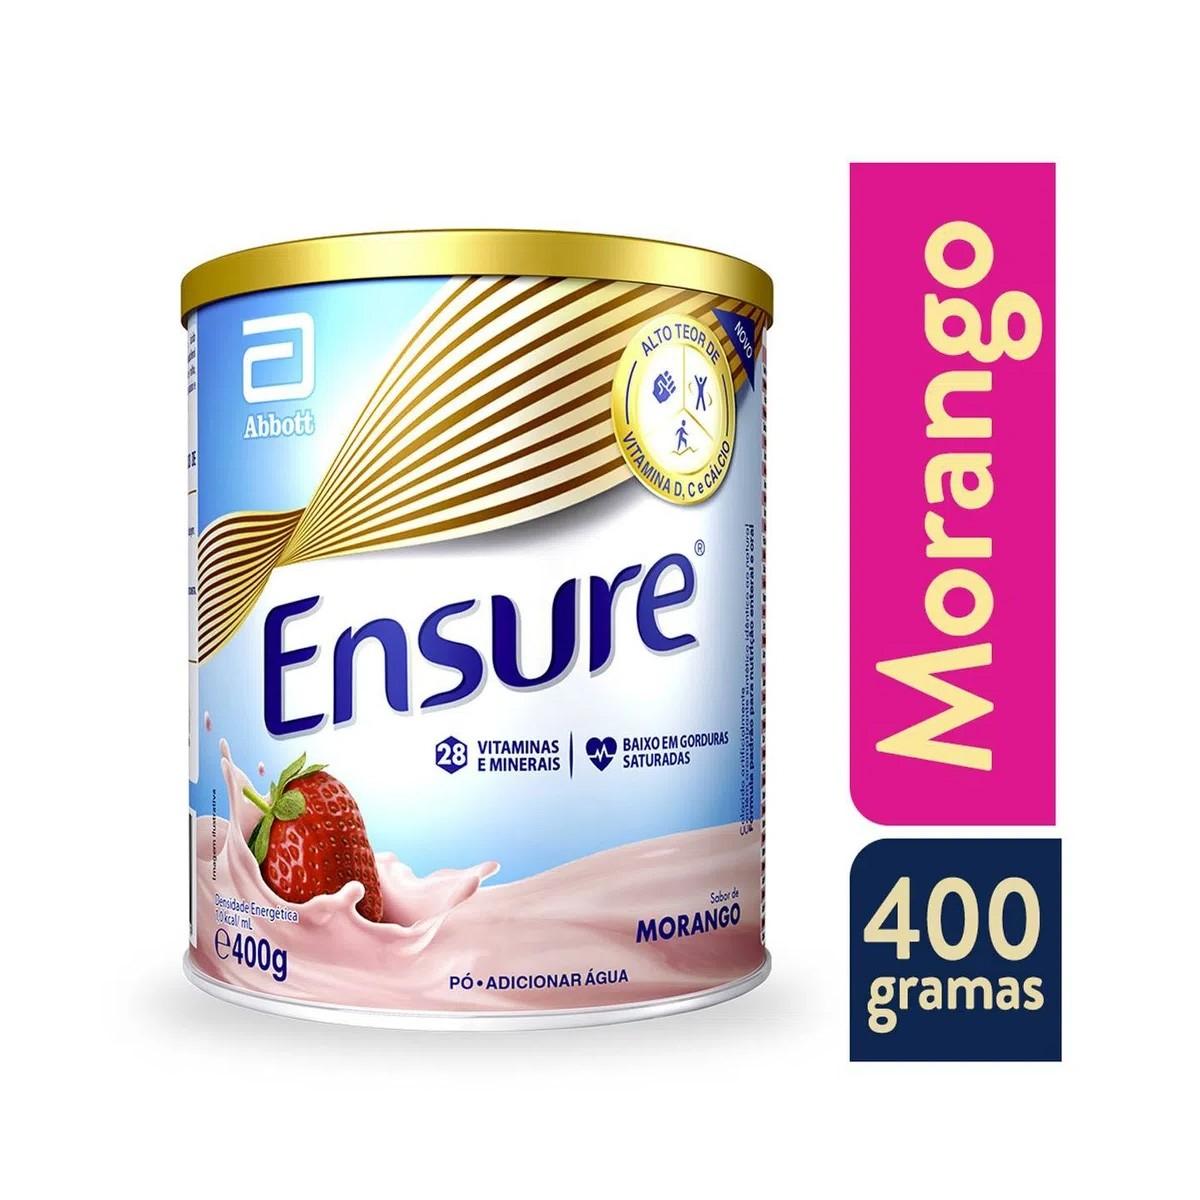 Ensure Morango 400g - Suplemento Alimentar